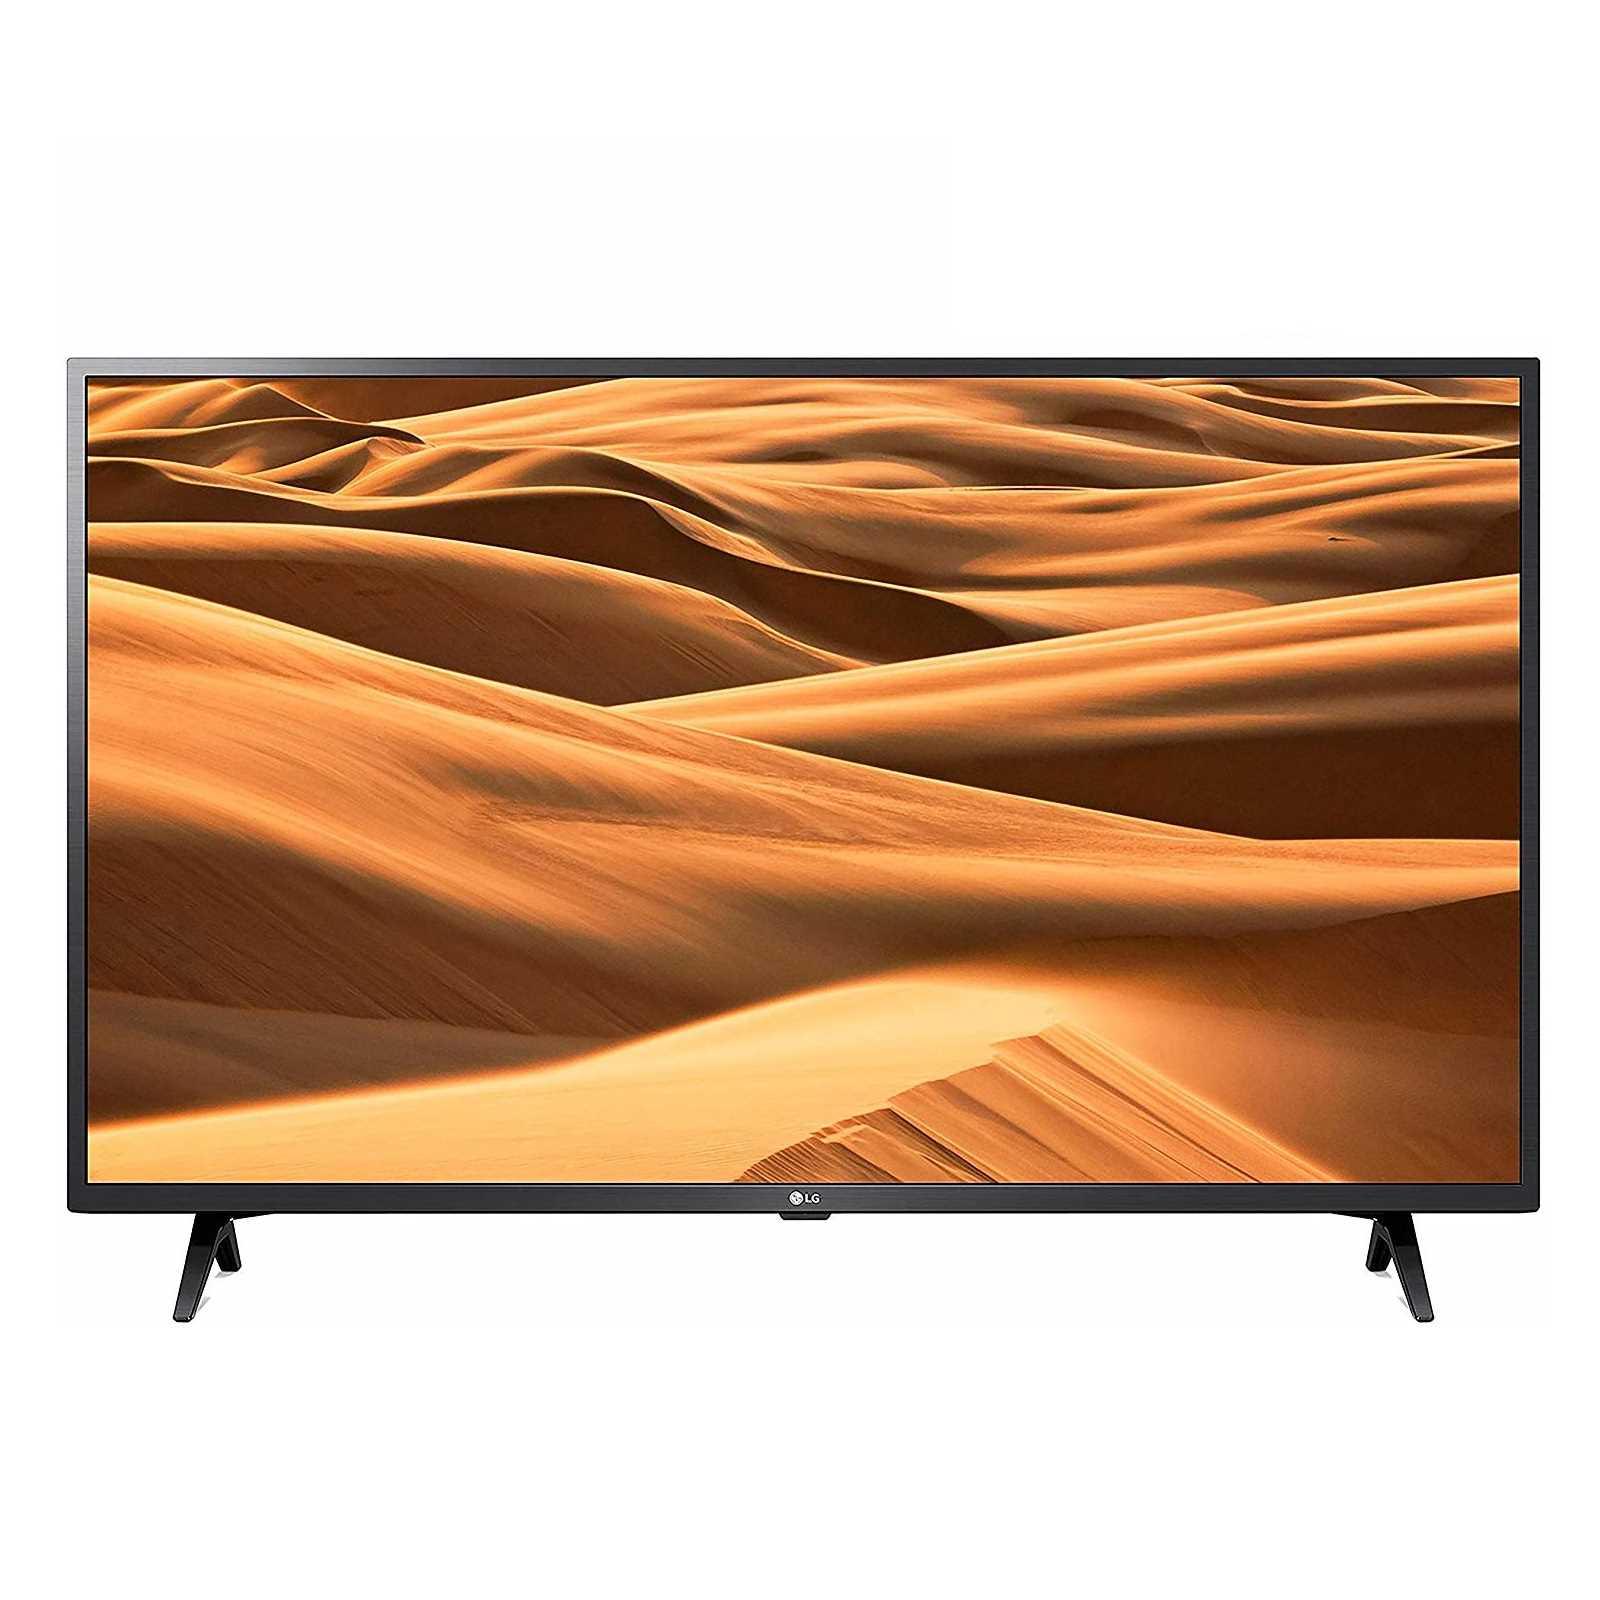 LG 43UM7290PTF 43 Inch 4K Ultra HD Smart LED Television